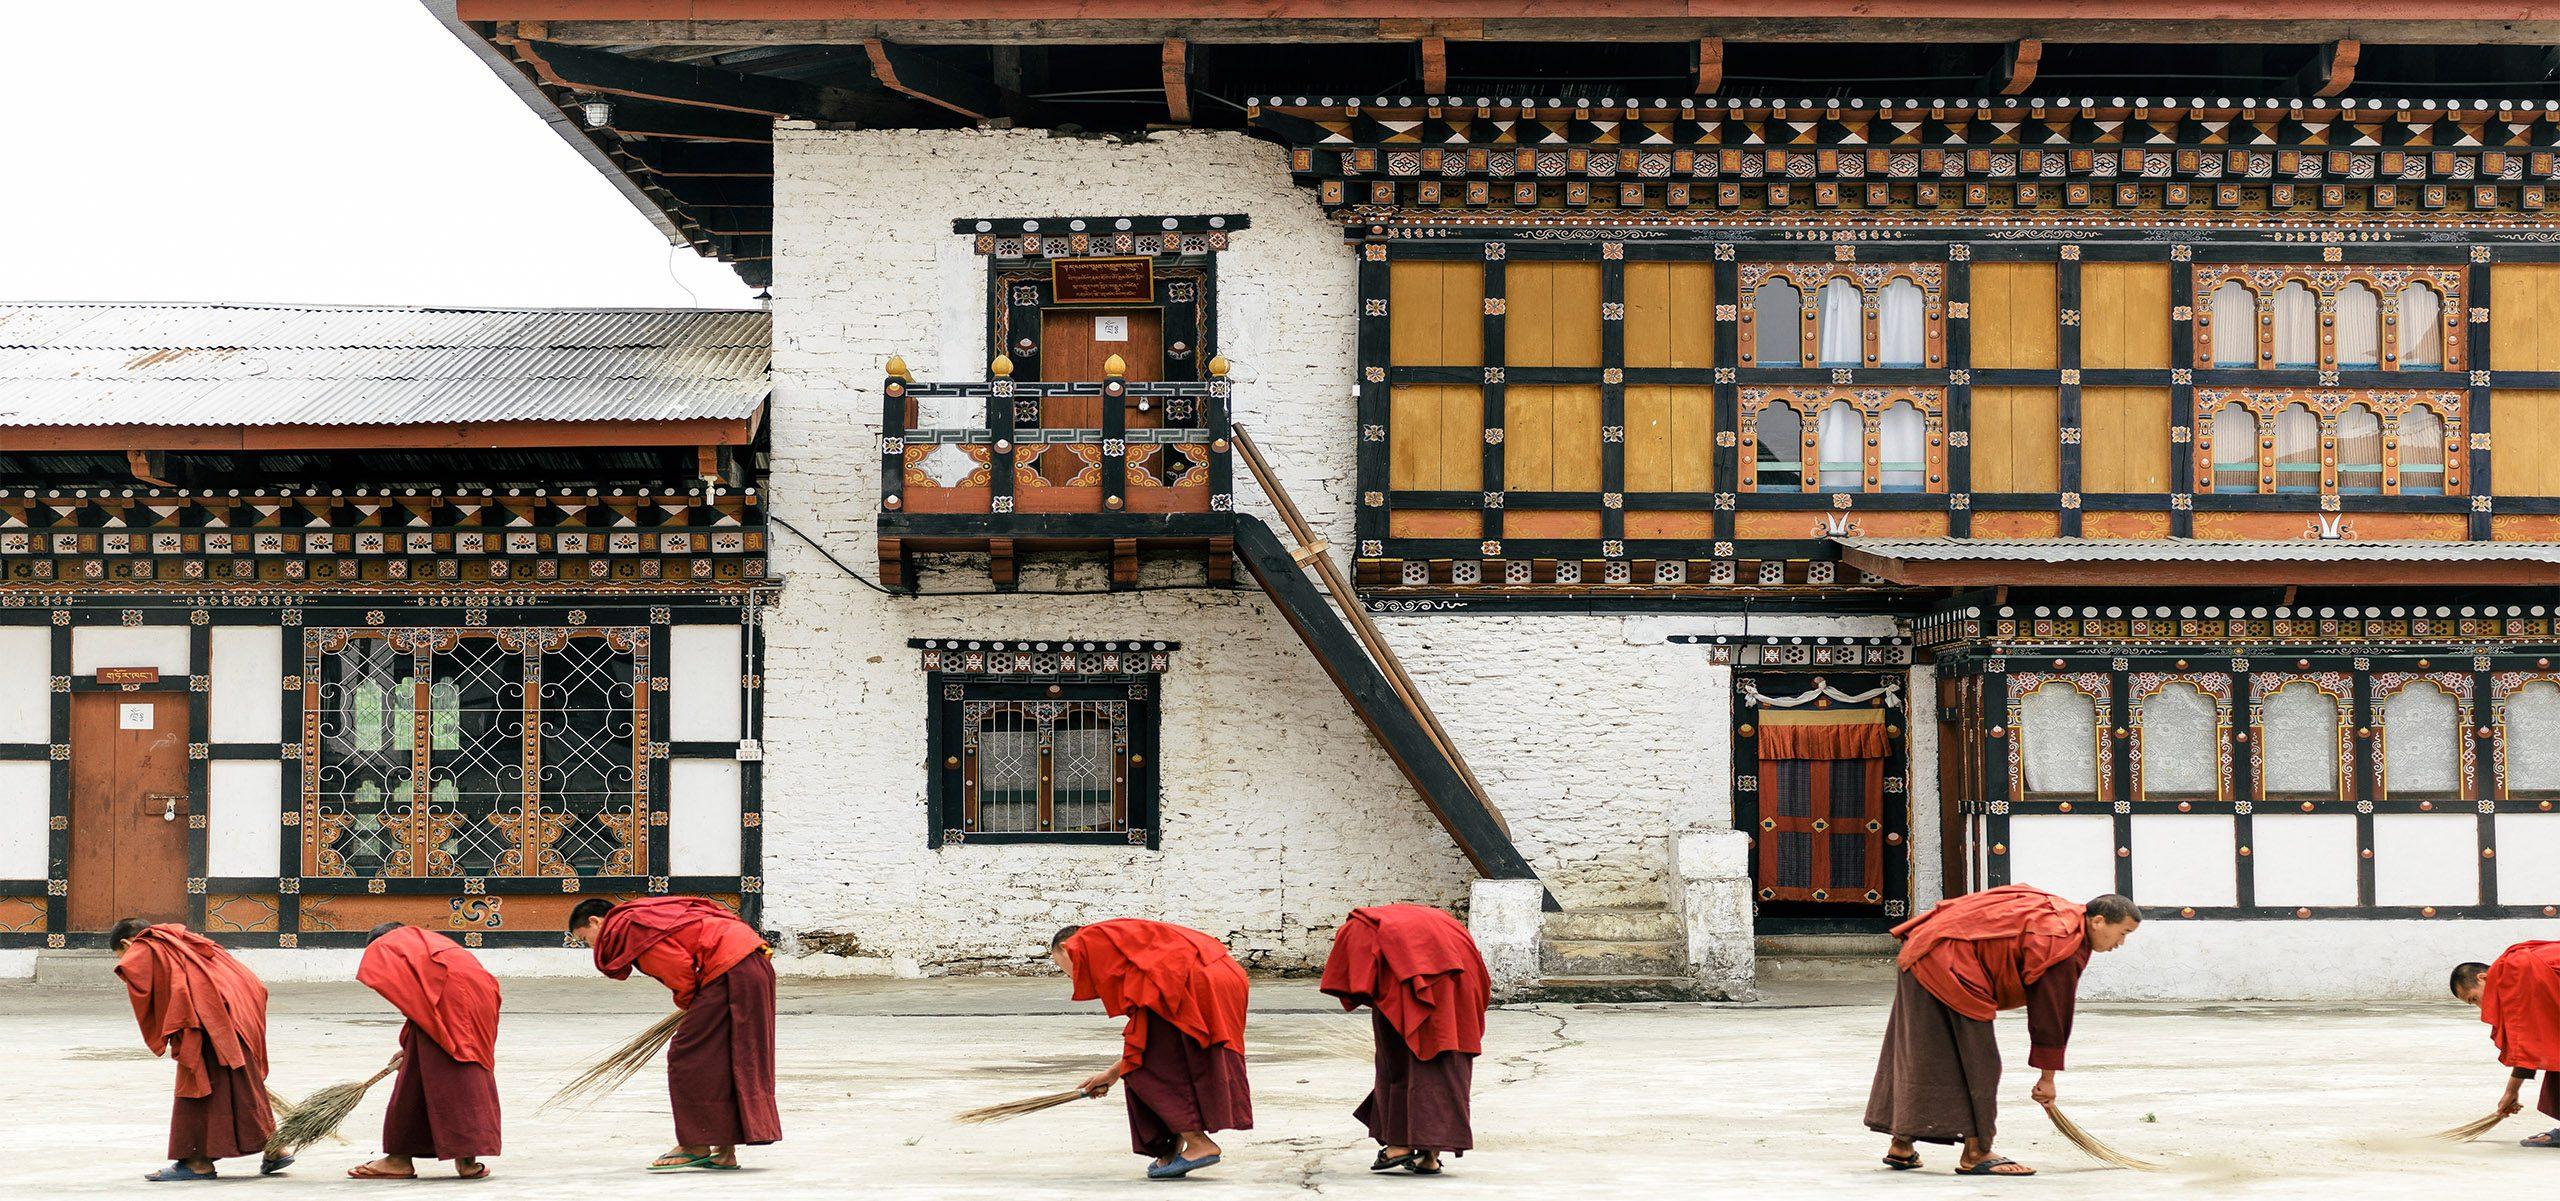 Bhutan - Drametse